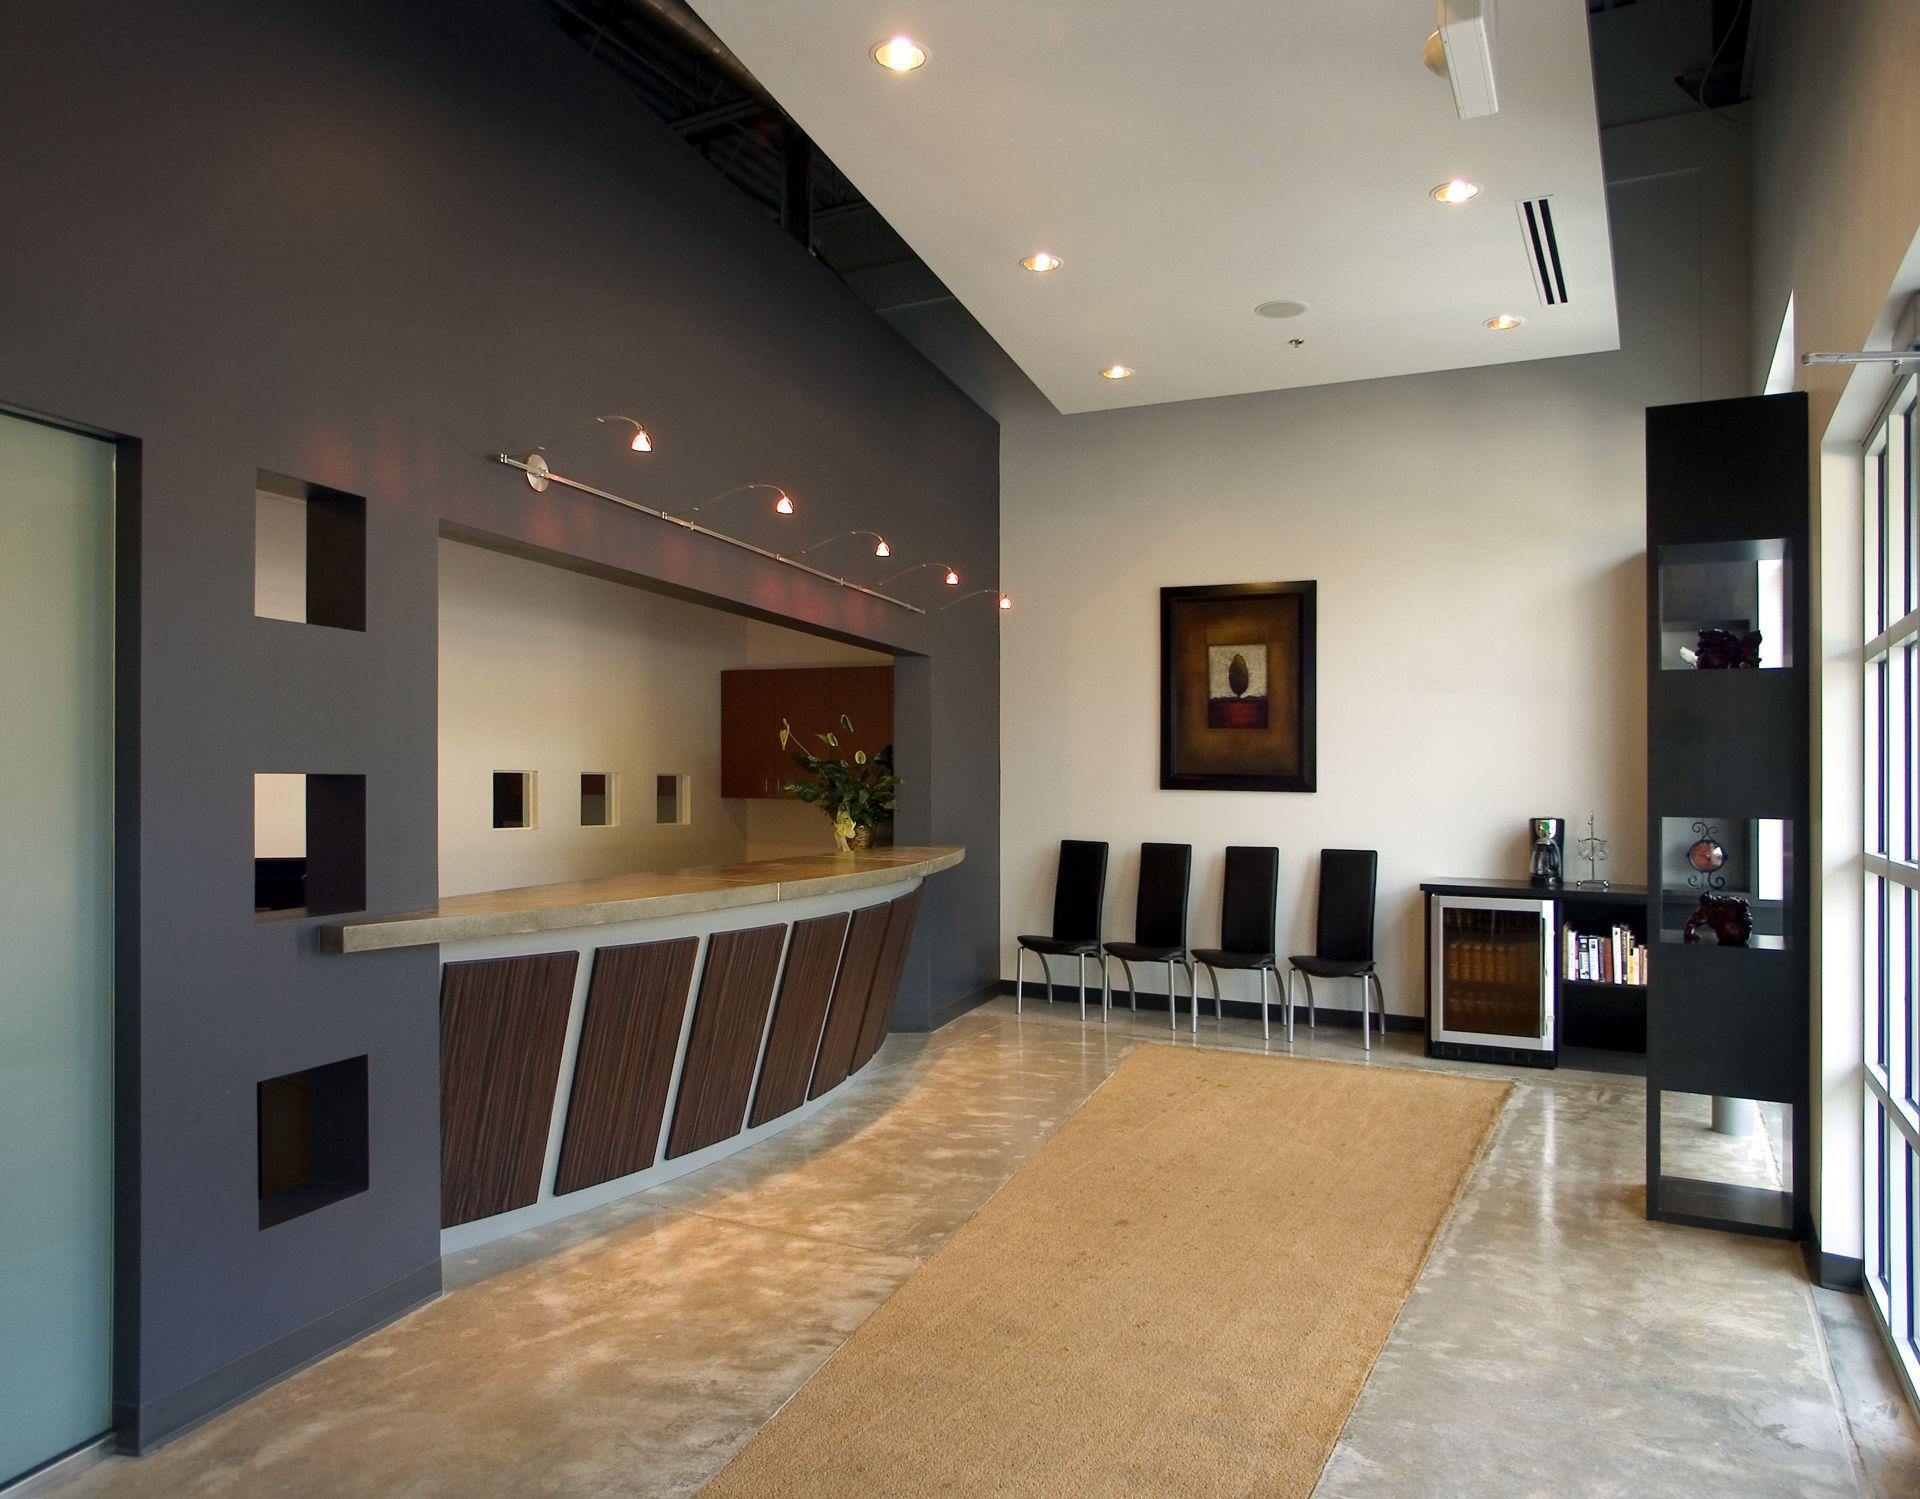 The Dental Shoppe Waiting Area